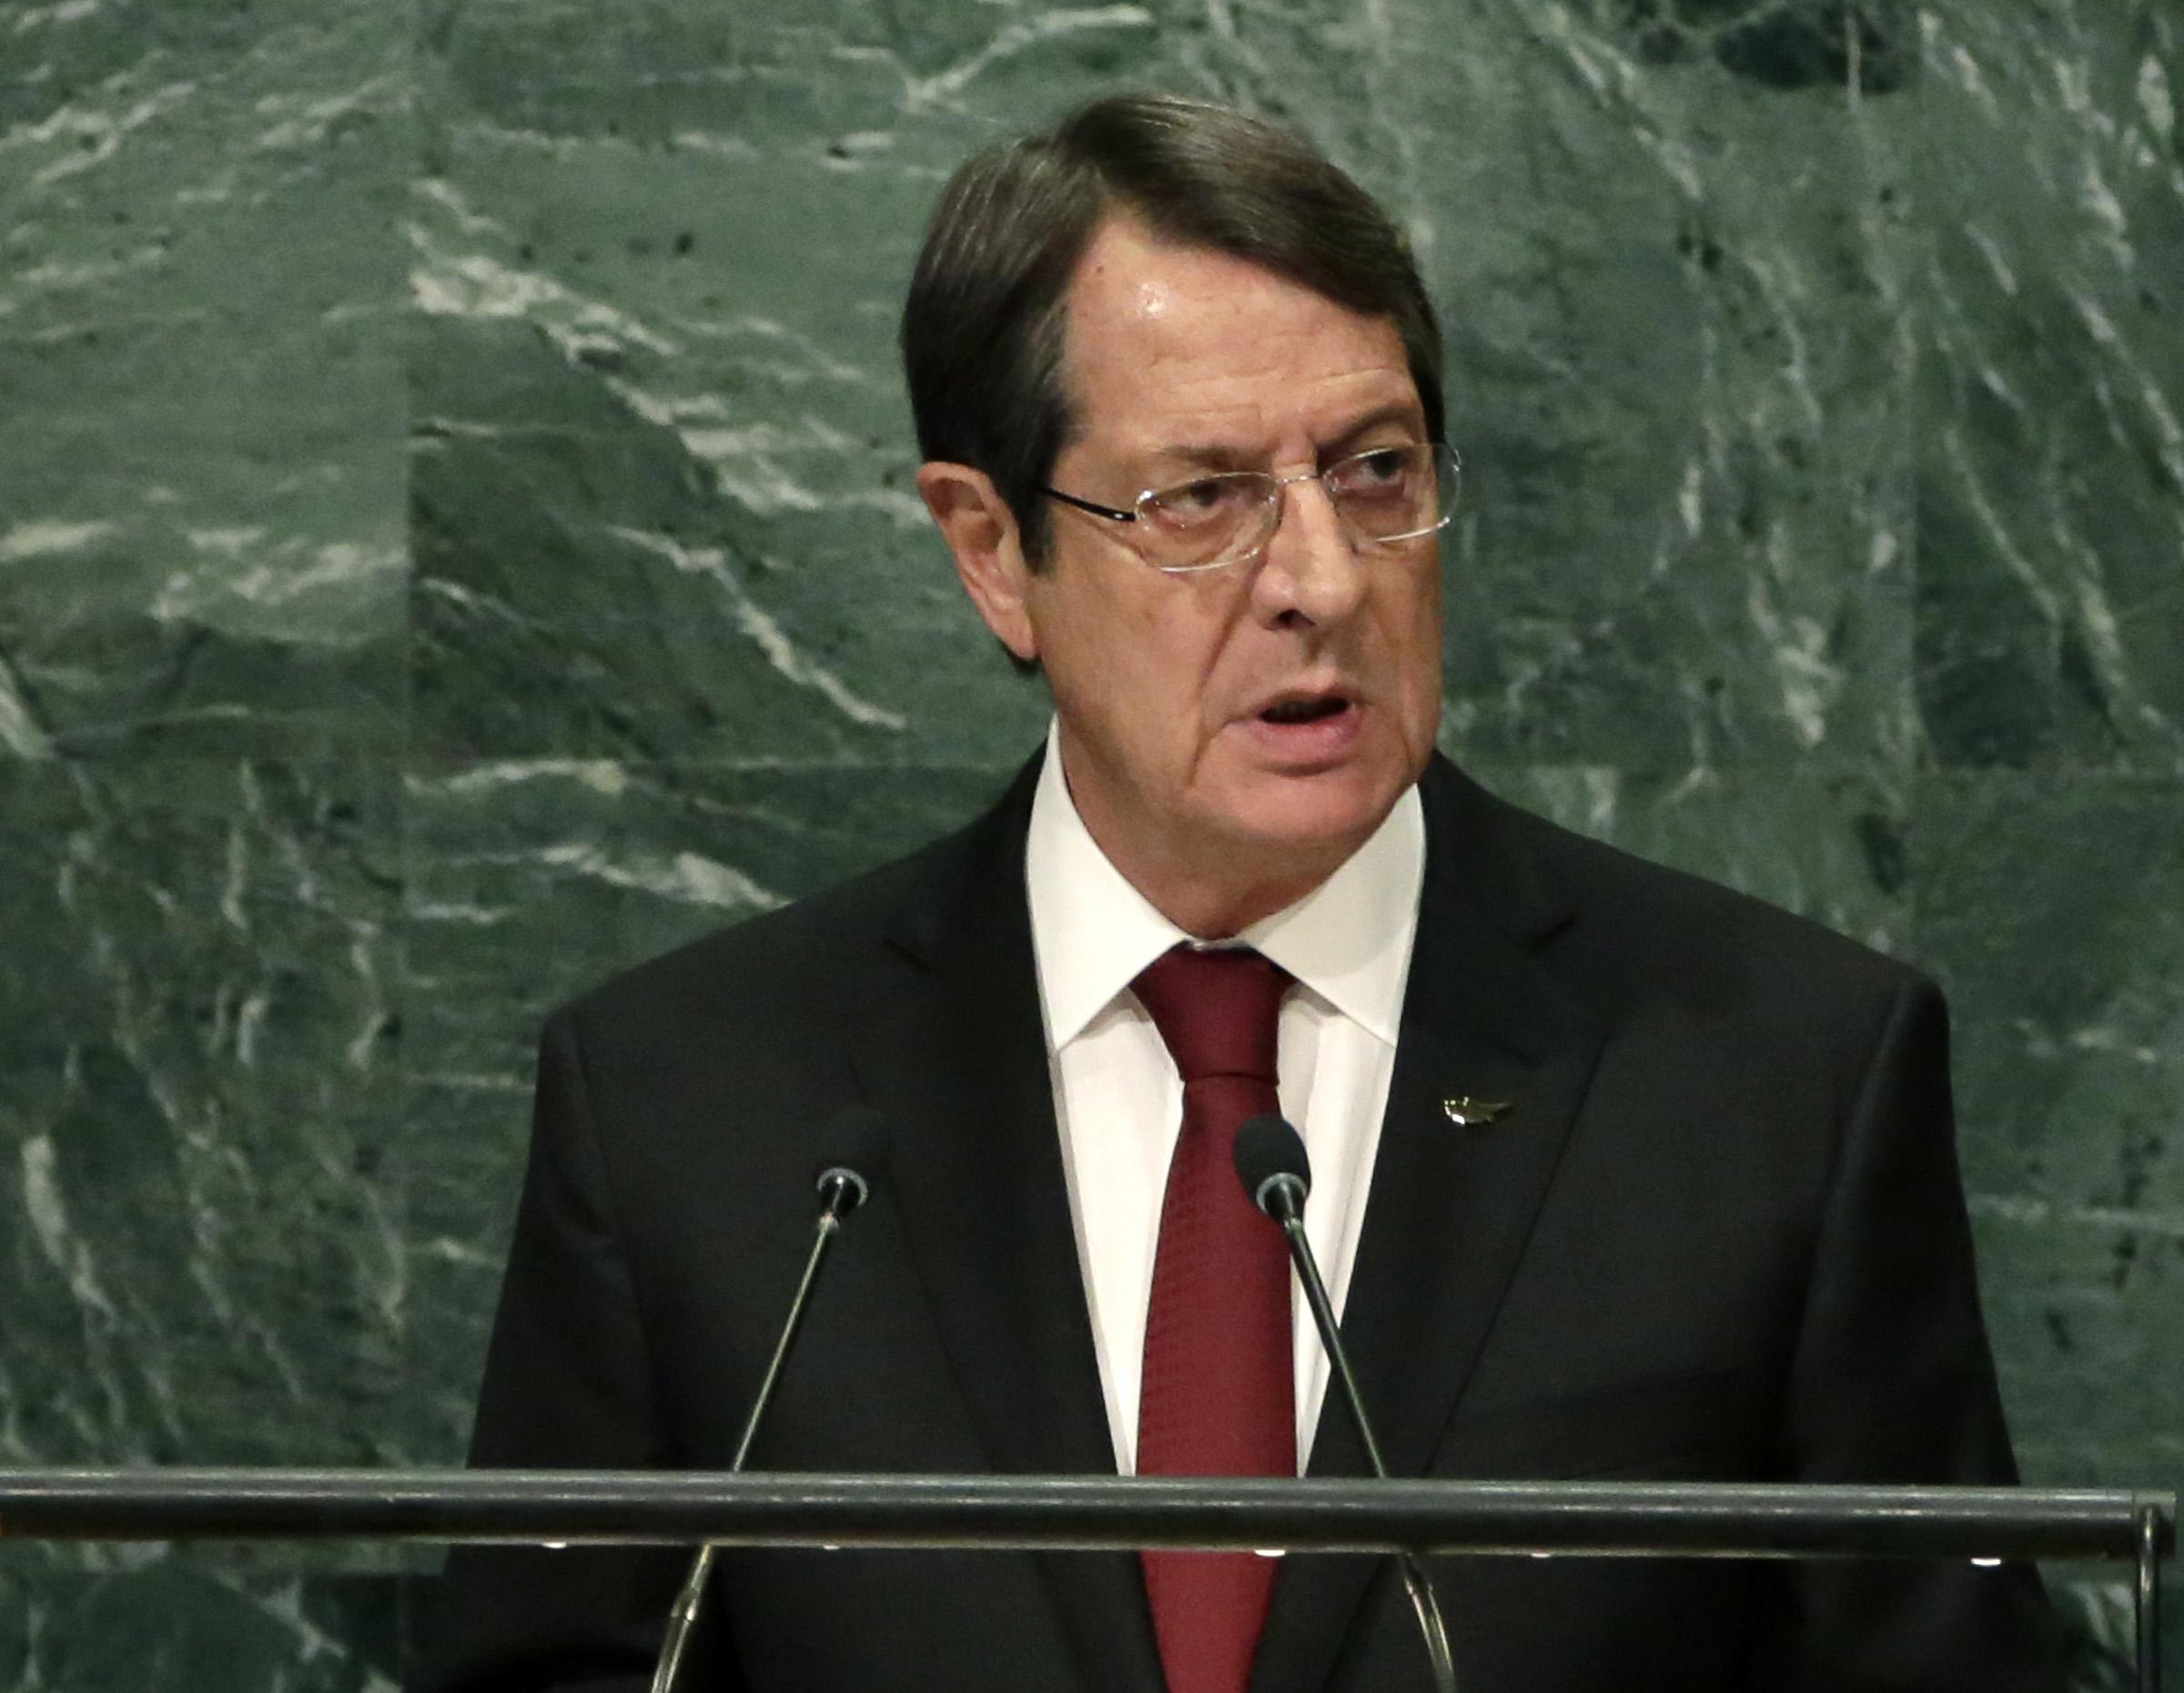 Anastasiades' UN speech focuses on BBF